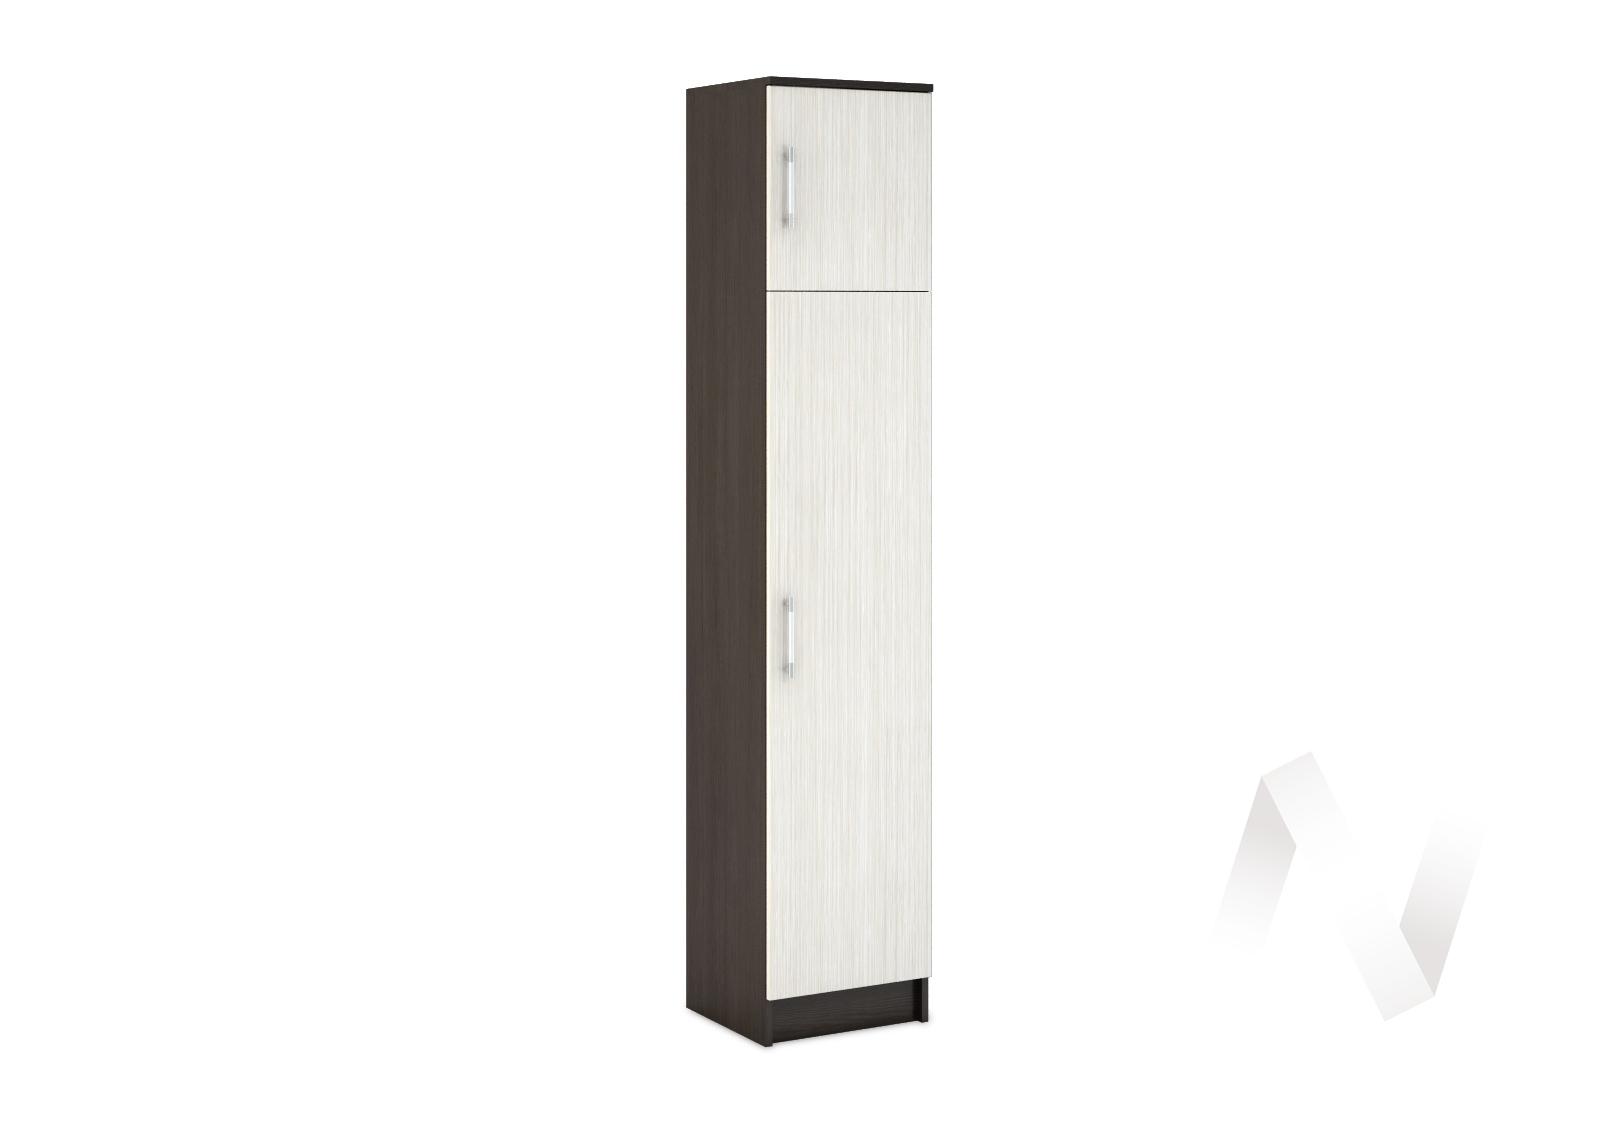 Шкаф одностворчатый бельевой Машенька (венге/дуб беленый) ШК-101